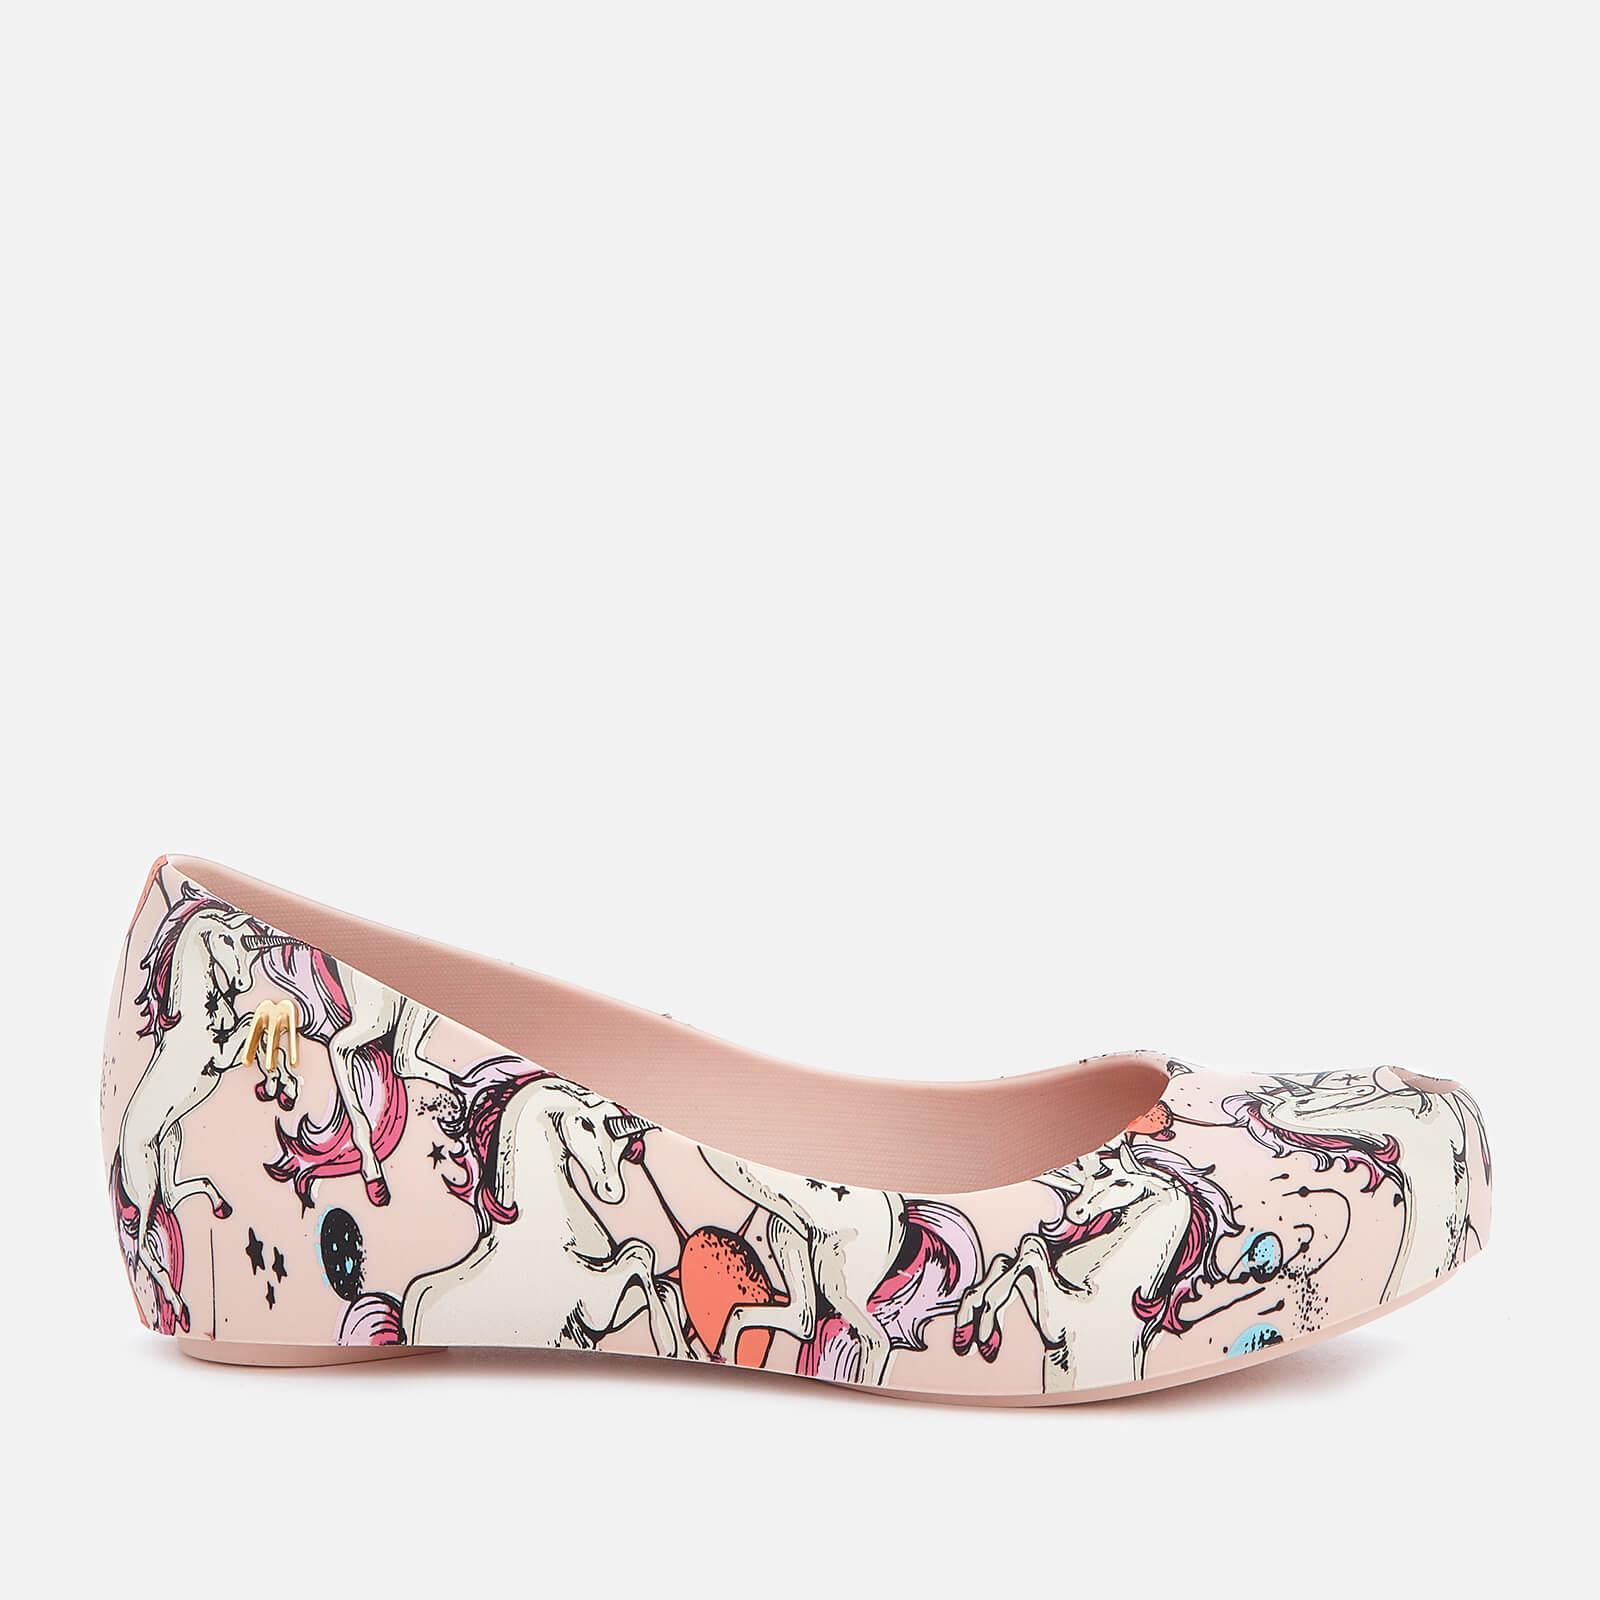 0b8b3ff8d7 Mini Melissa Kids' Ultragirl Fantasy 20 Ballet Flats - Blush Unicorn Junior  Clothing | TheHut.com